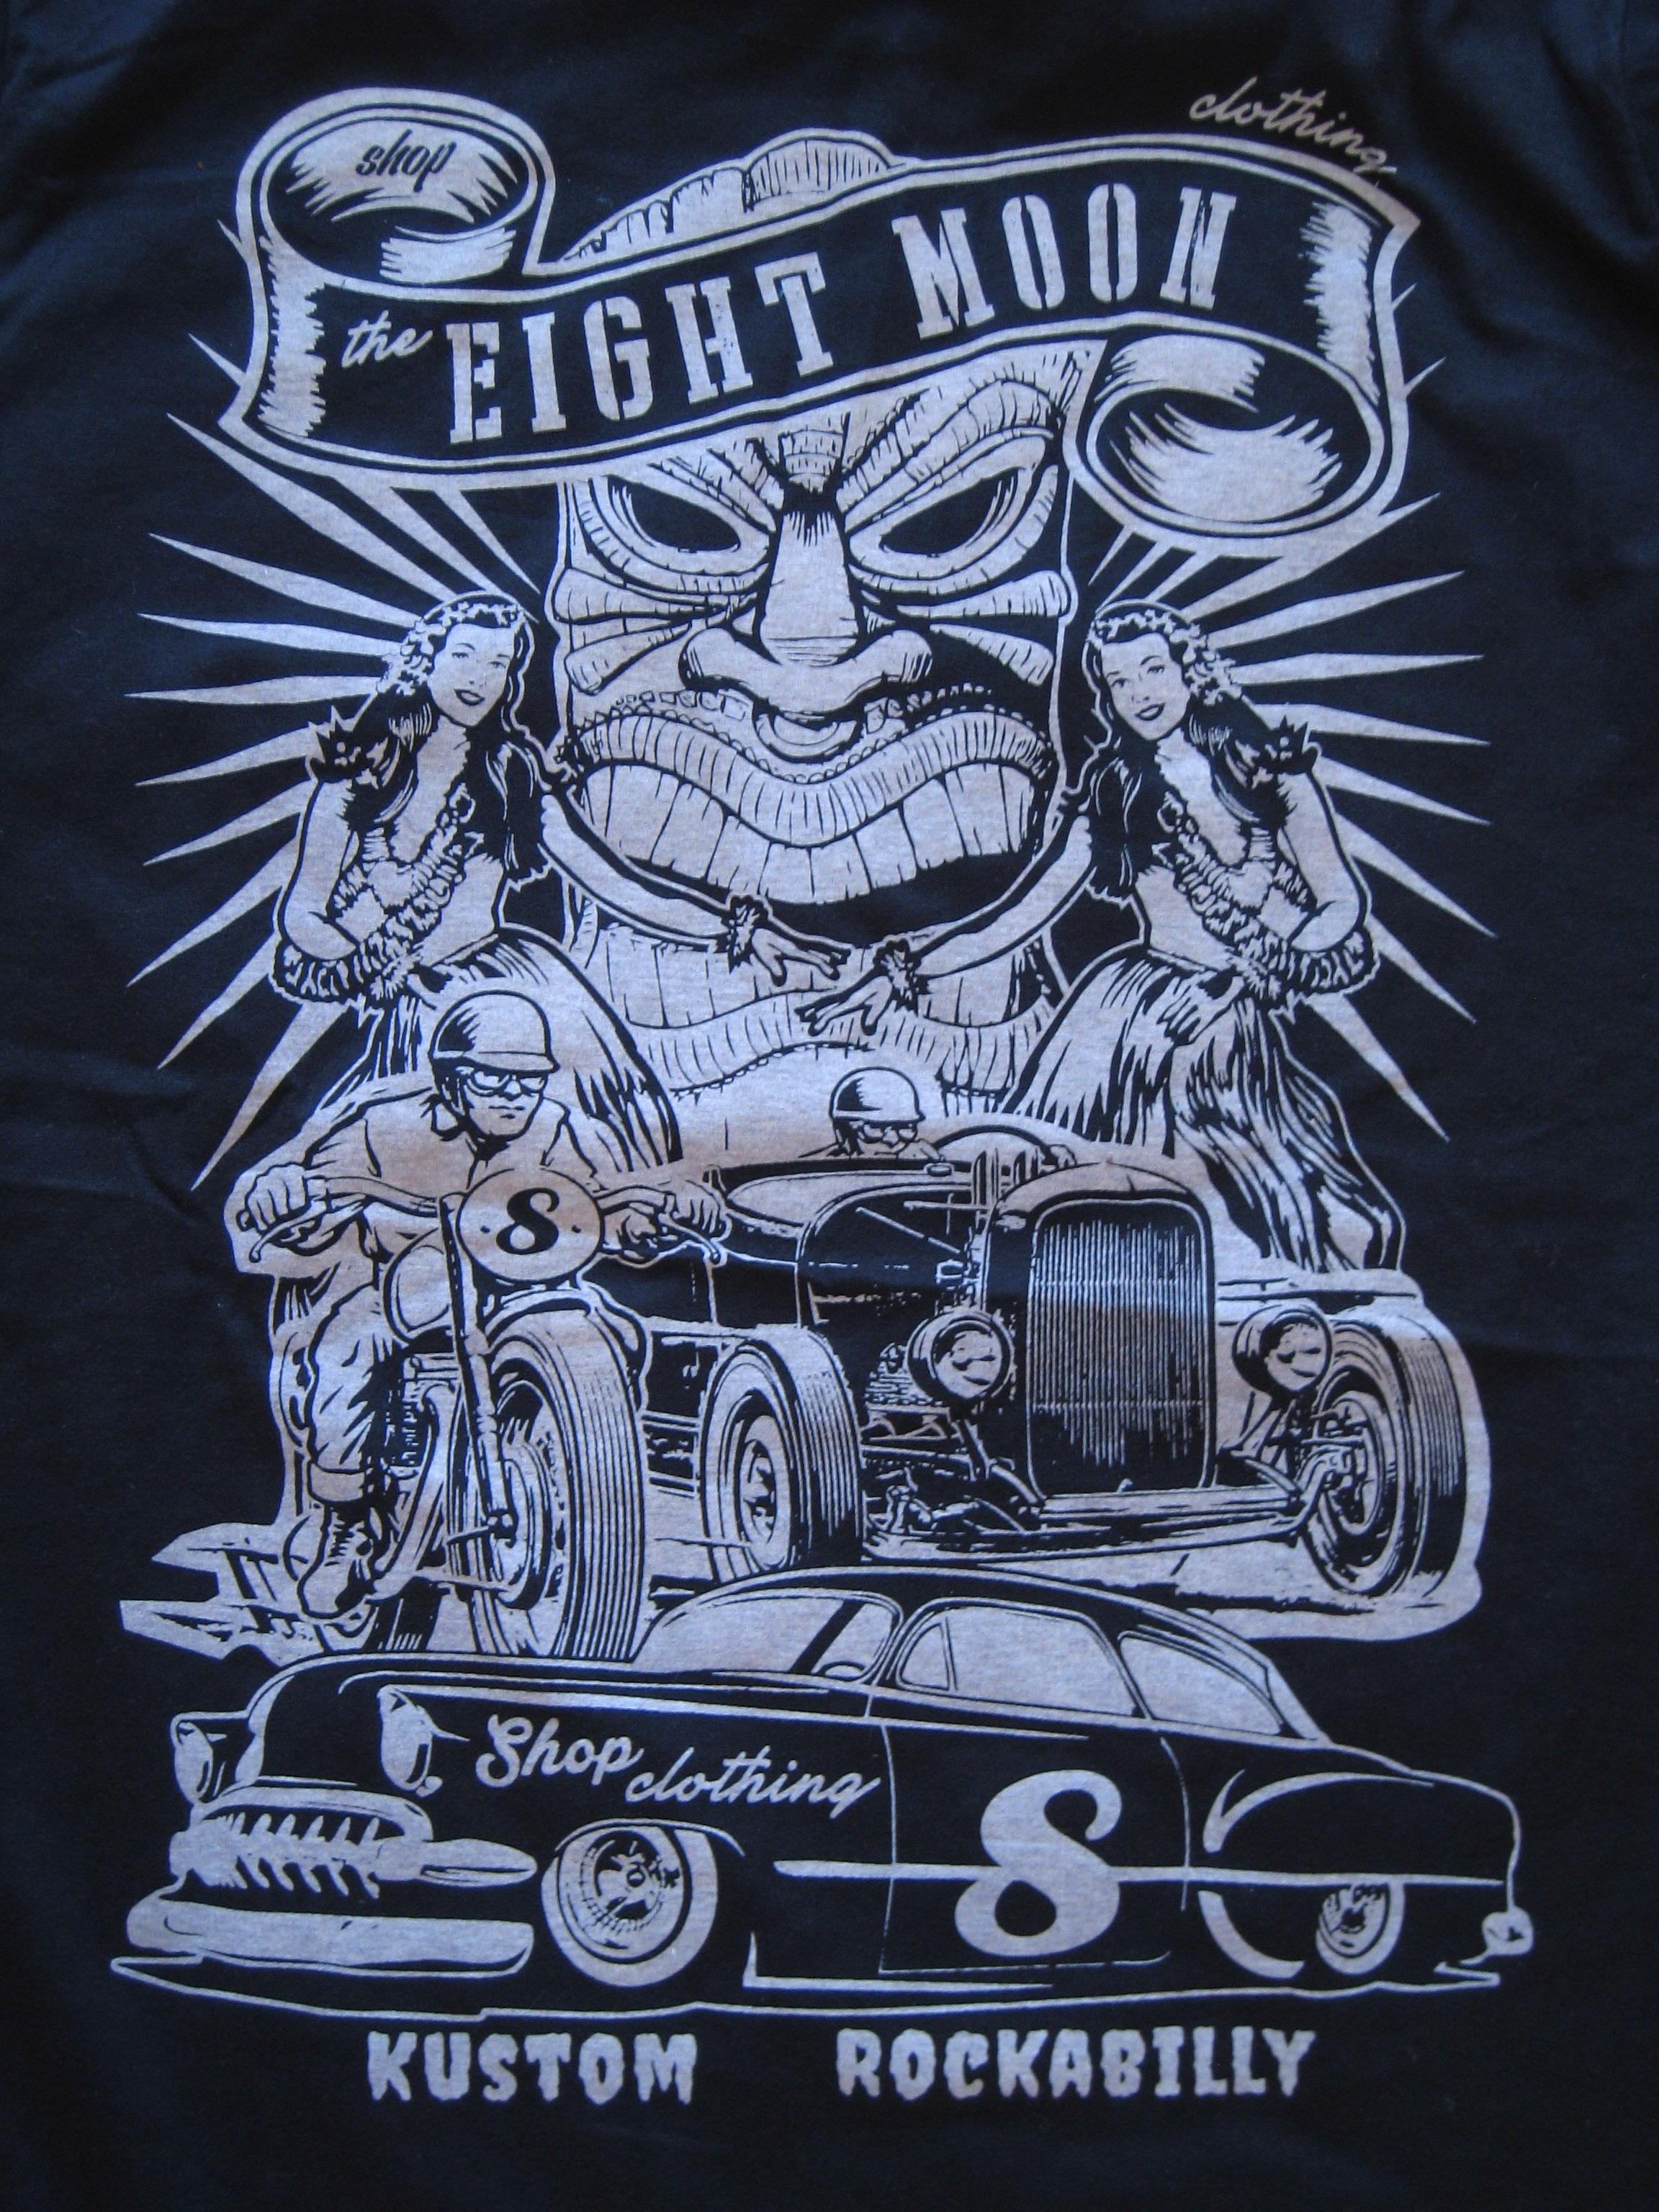 eight_moon_rockabilly_mens_shirt_custom_cars_hot_rod_cafe_racer_en1_t_shirts_5.jpg